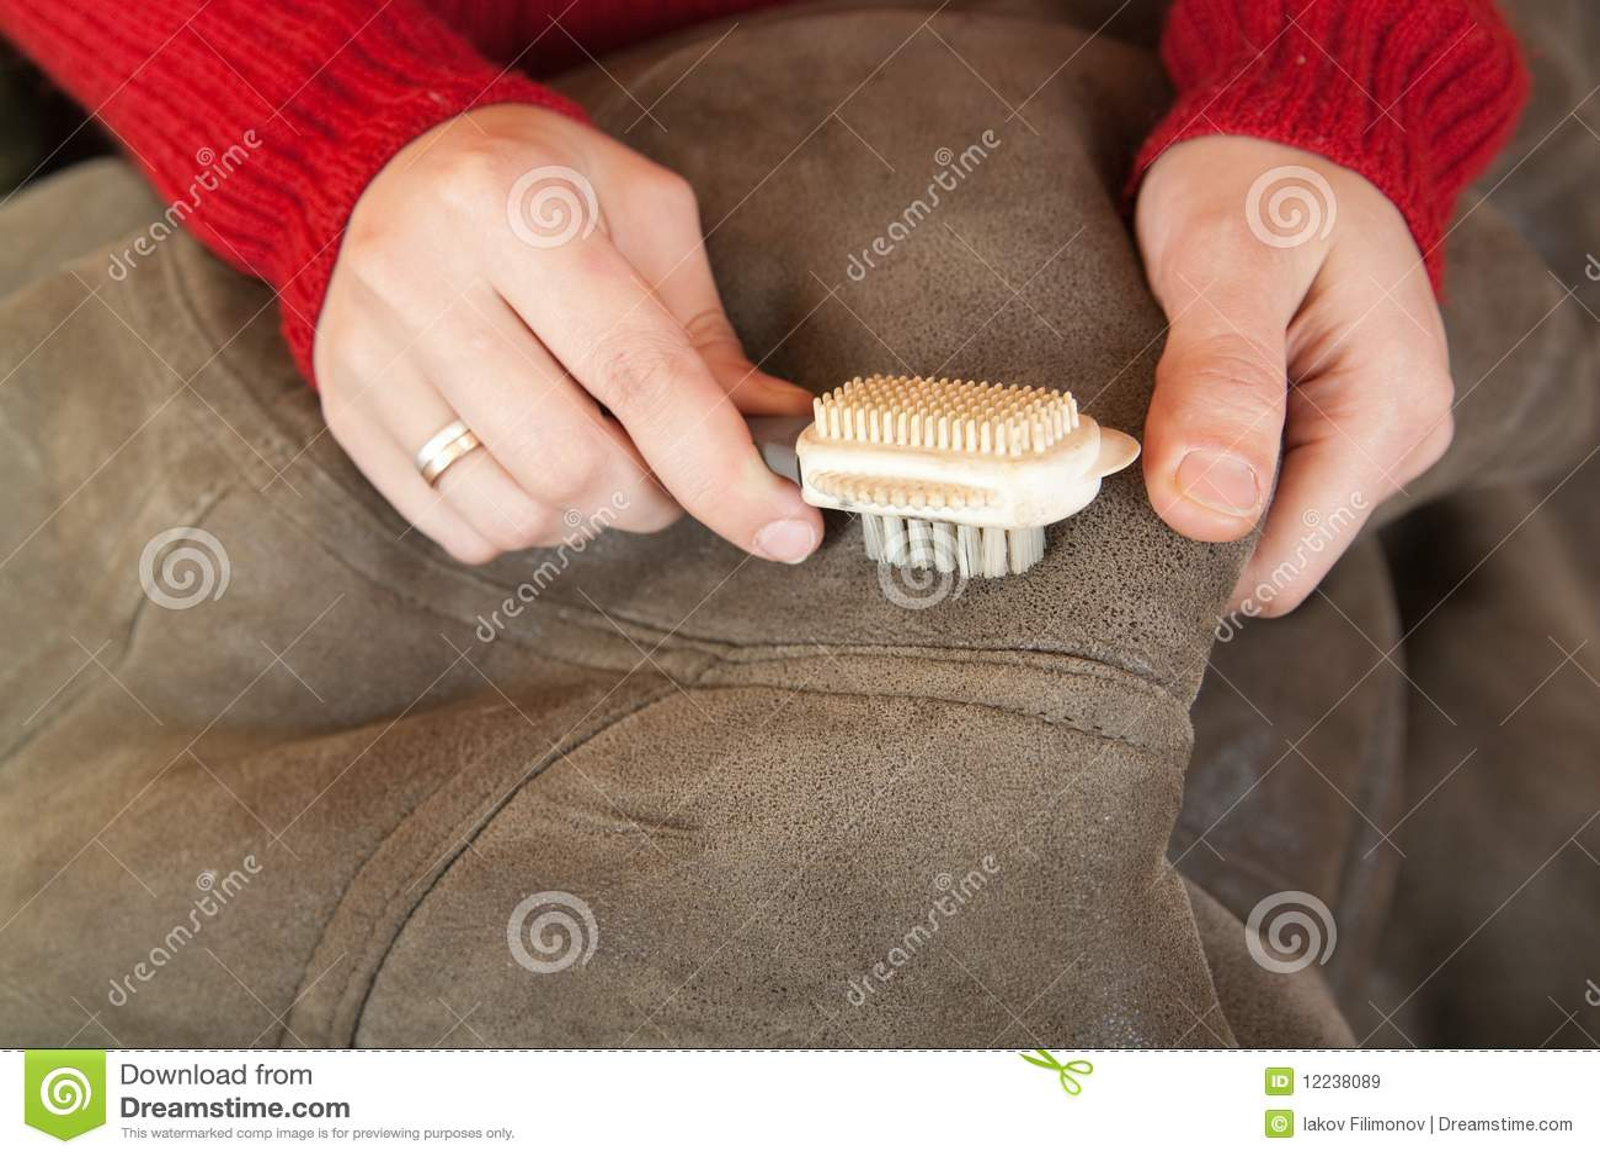 Чем почистить белую замшу в домашних условиях